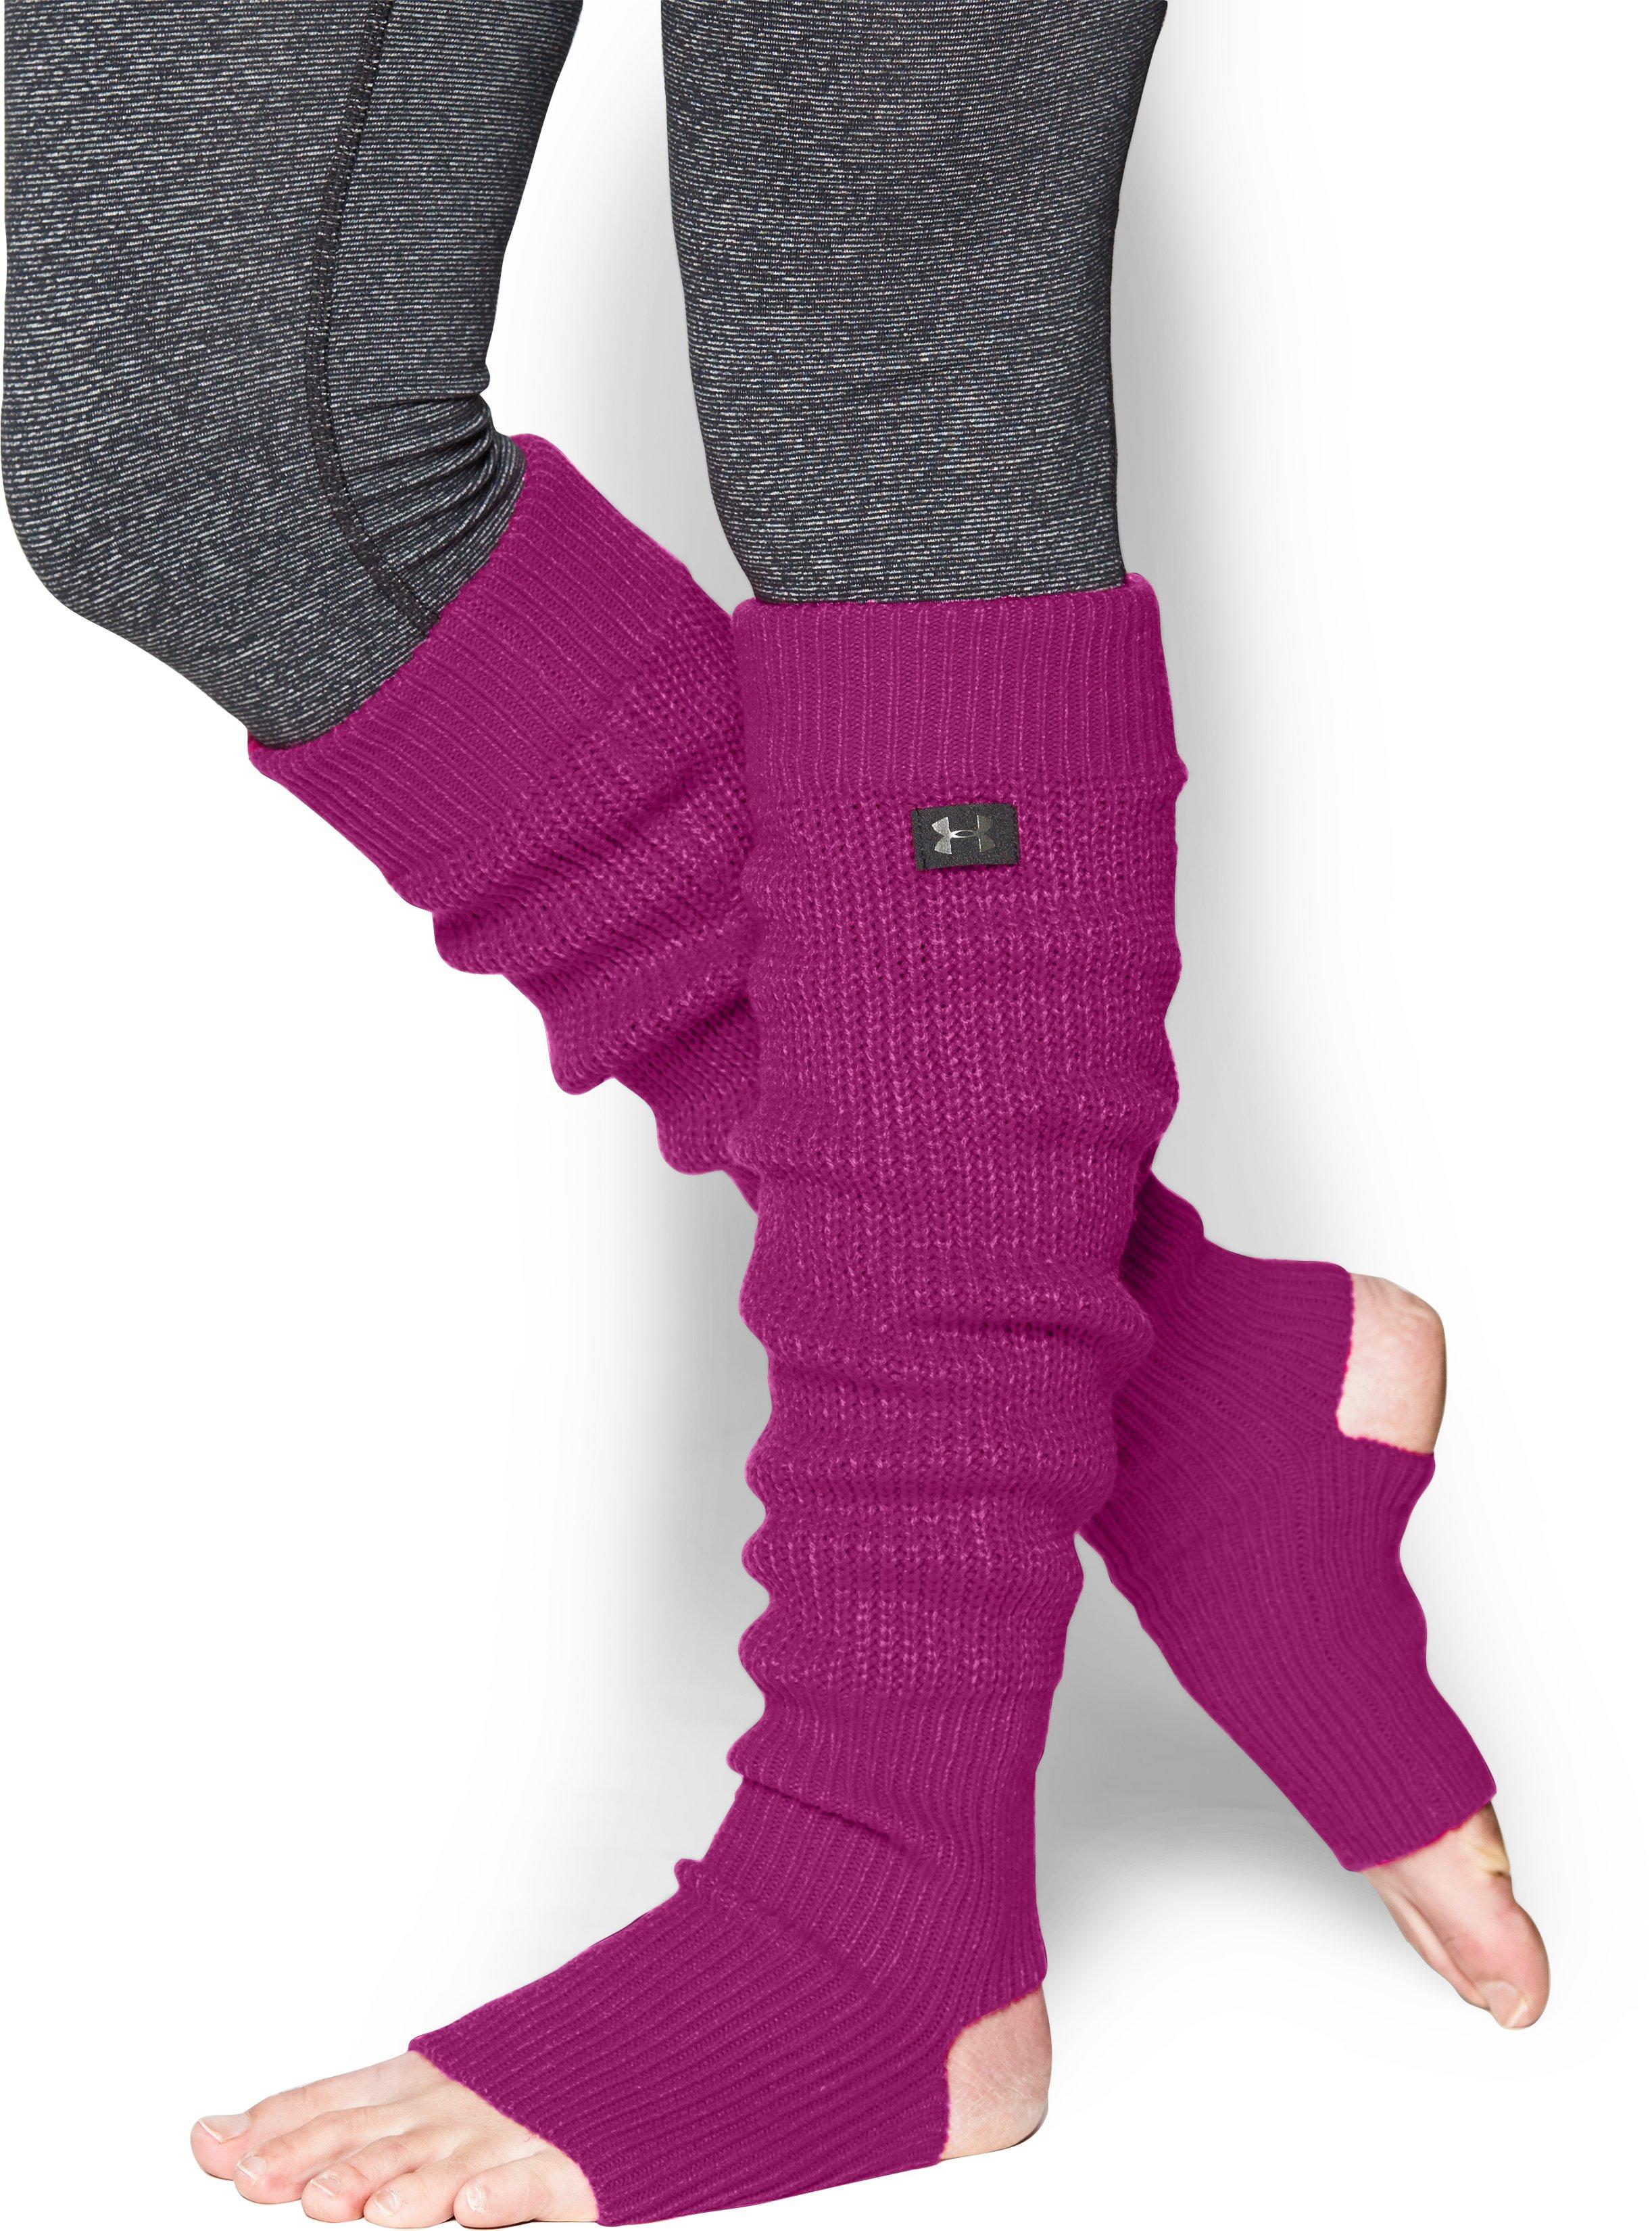 Womenu0026#39;s UA Leg Warmers | Under Armour US